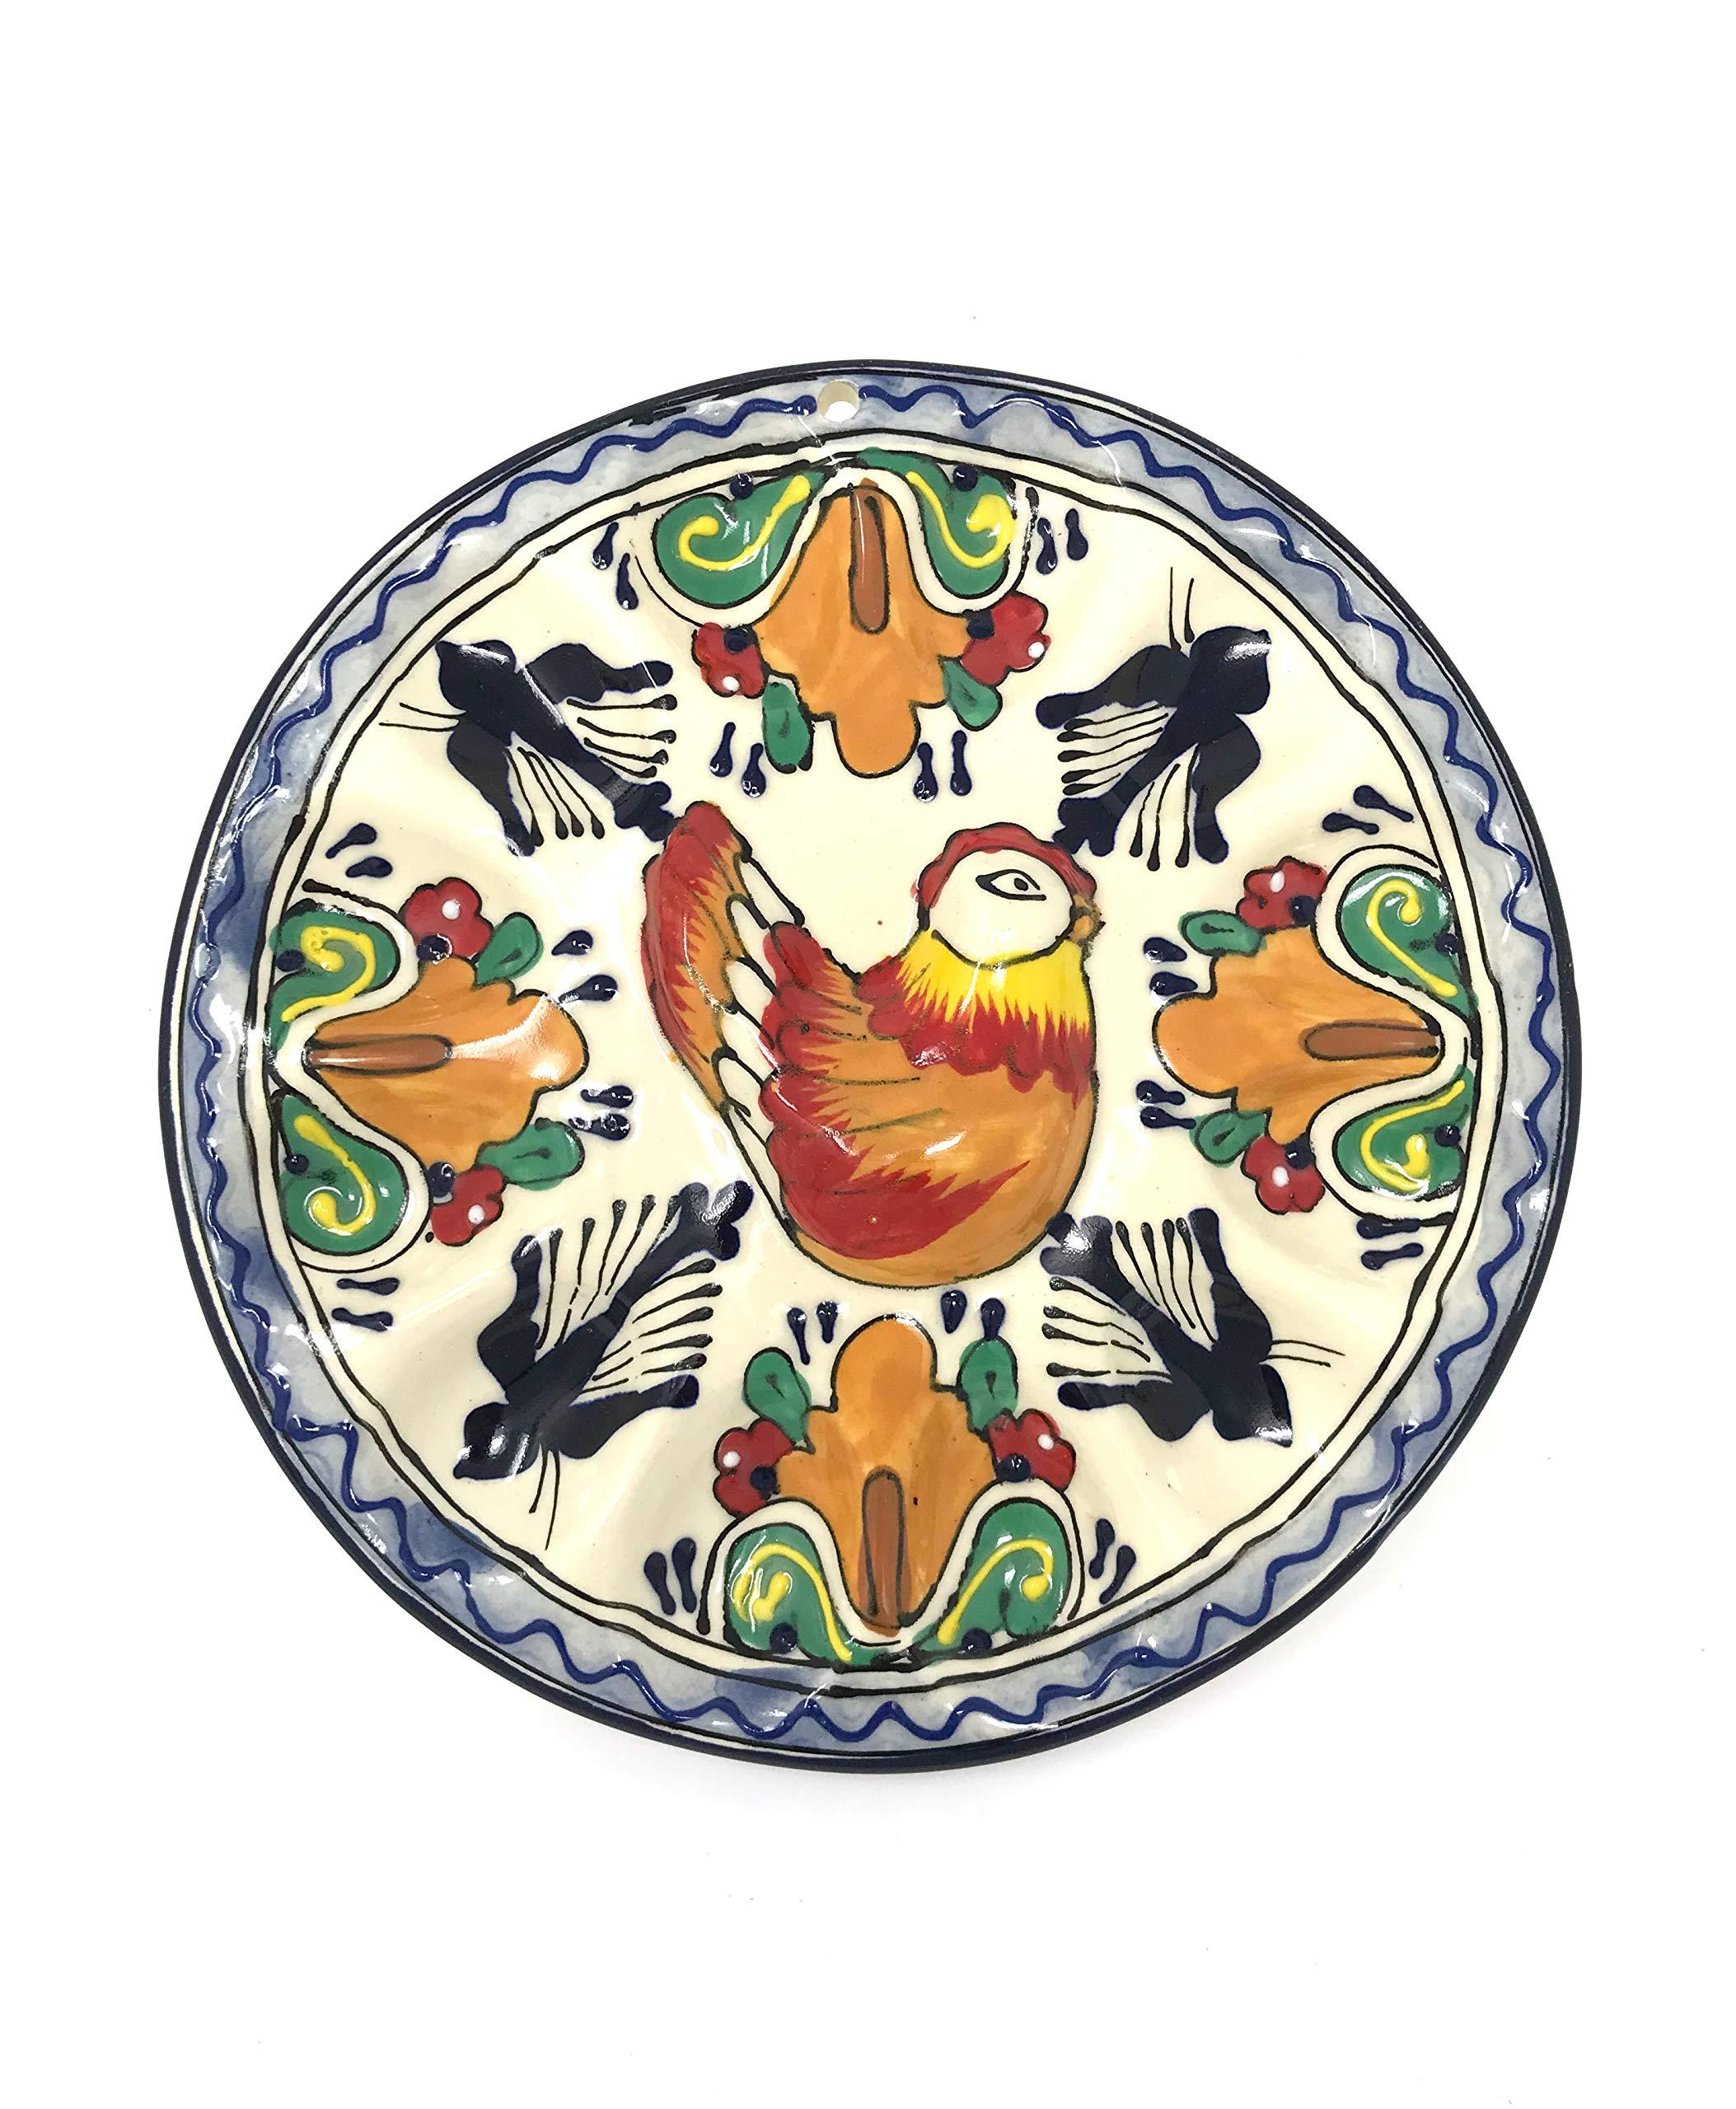 Mexican Talavera Round Deviled Egg Tray Platter